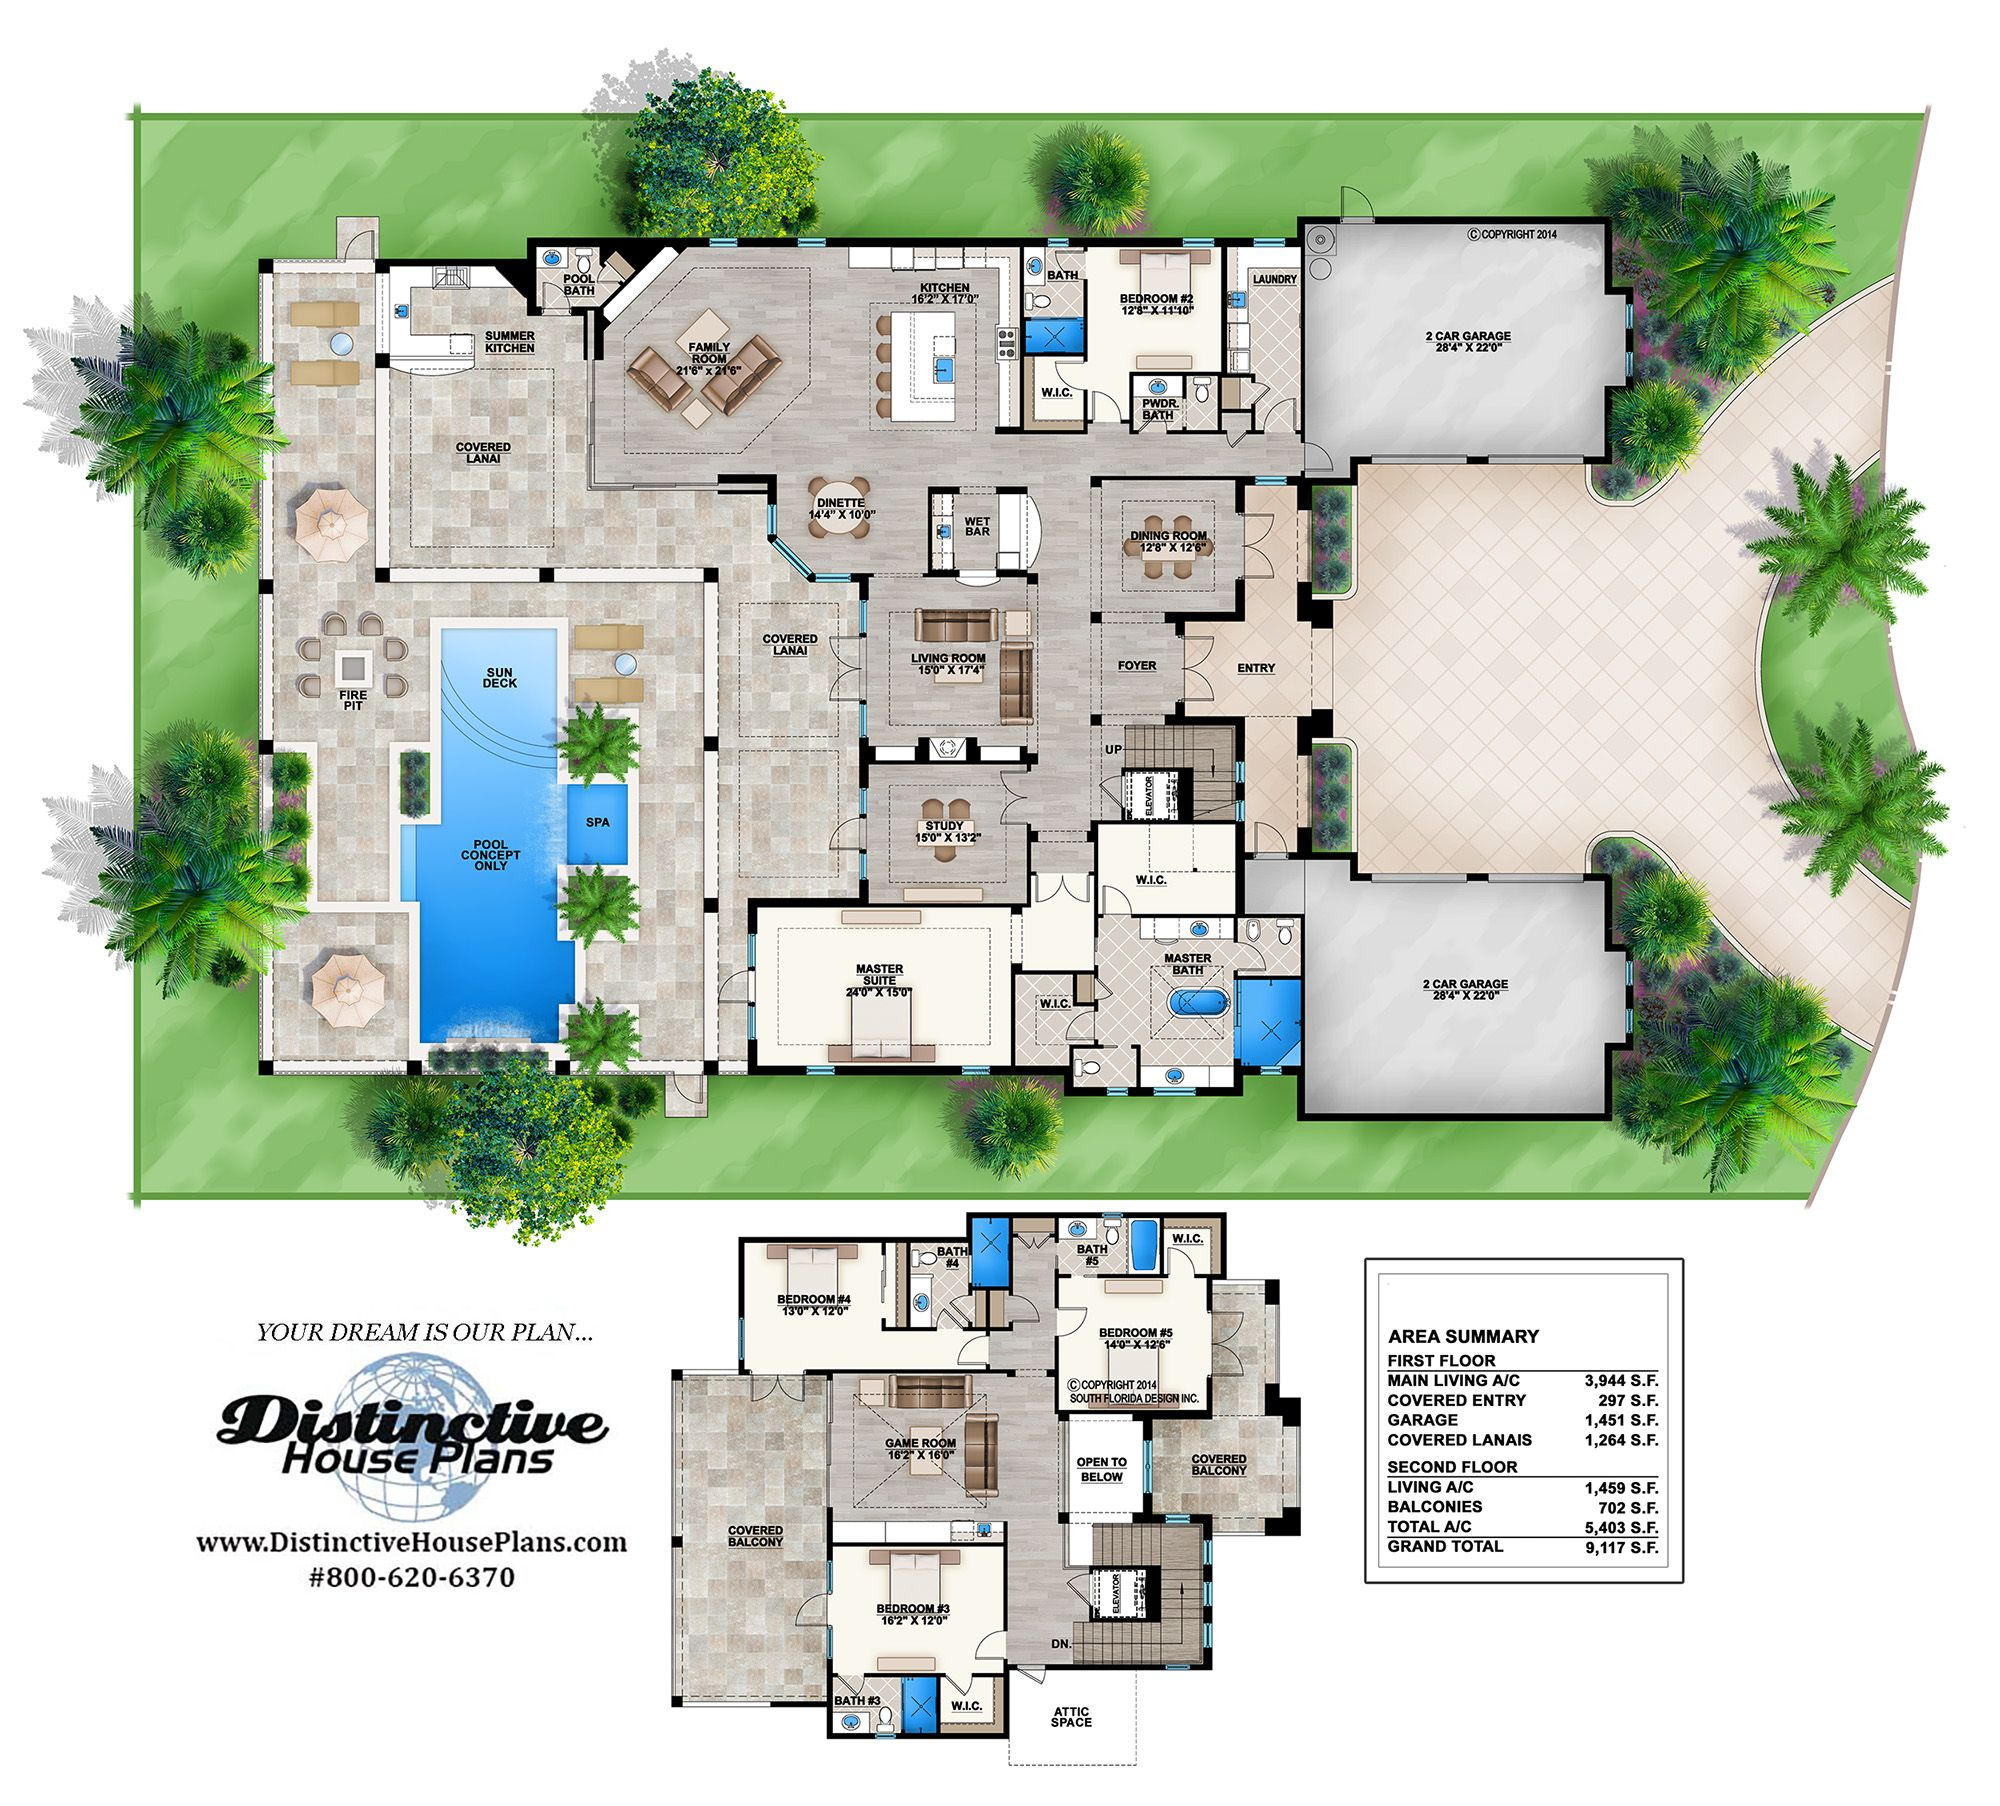 Distinctivehouseplans Com Beach Coastal Caribbean House Plans Single Family Coastal House Plans Contemporary House Plans Modern Contemporary House Plans